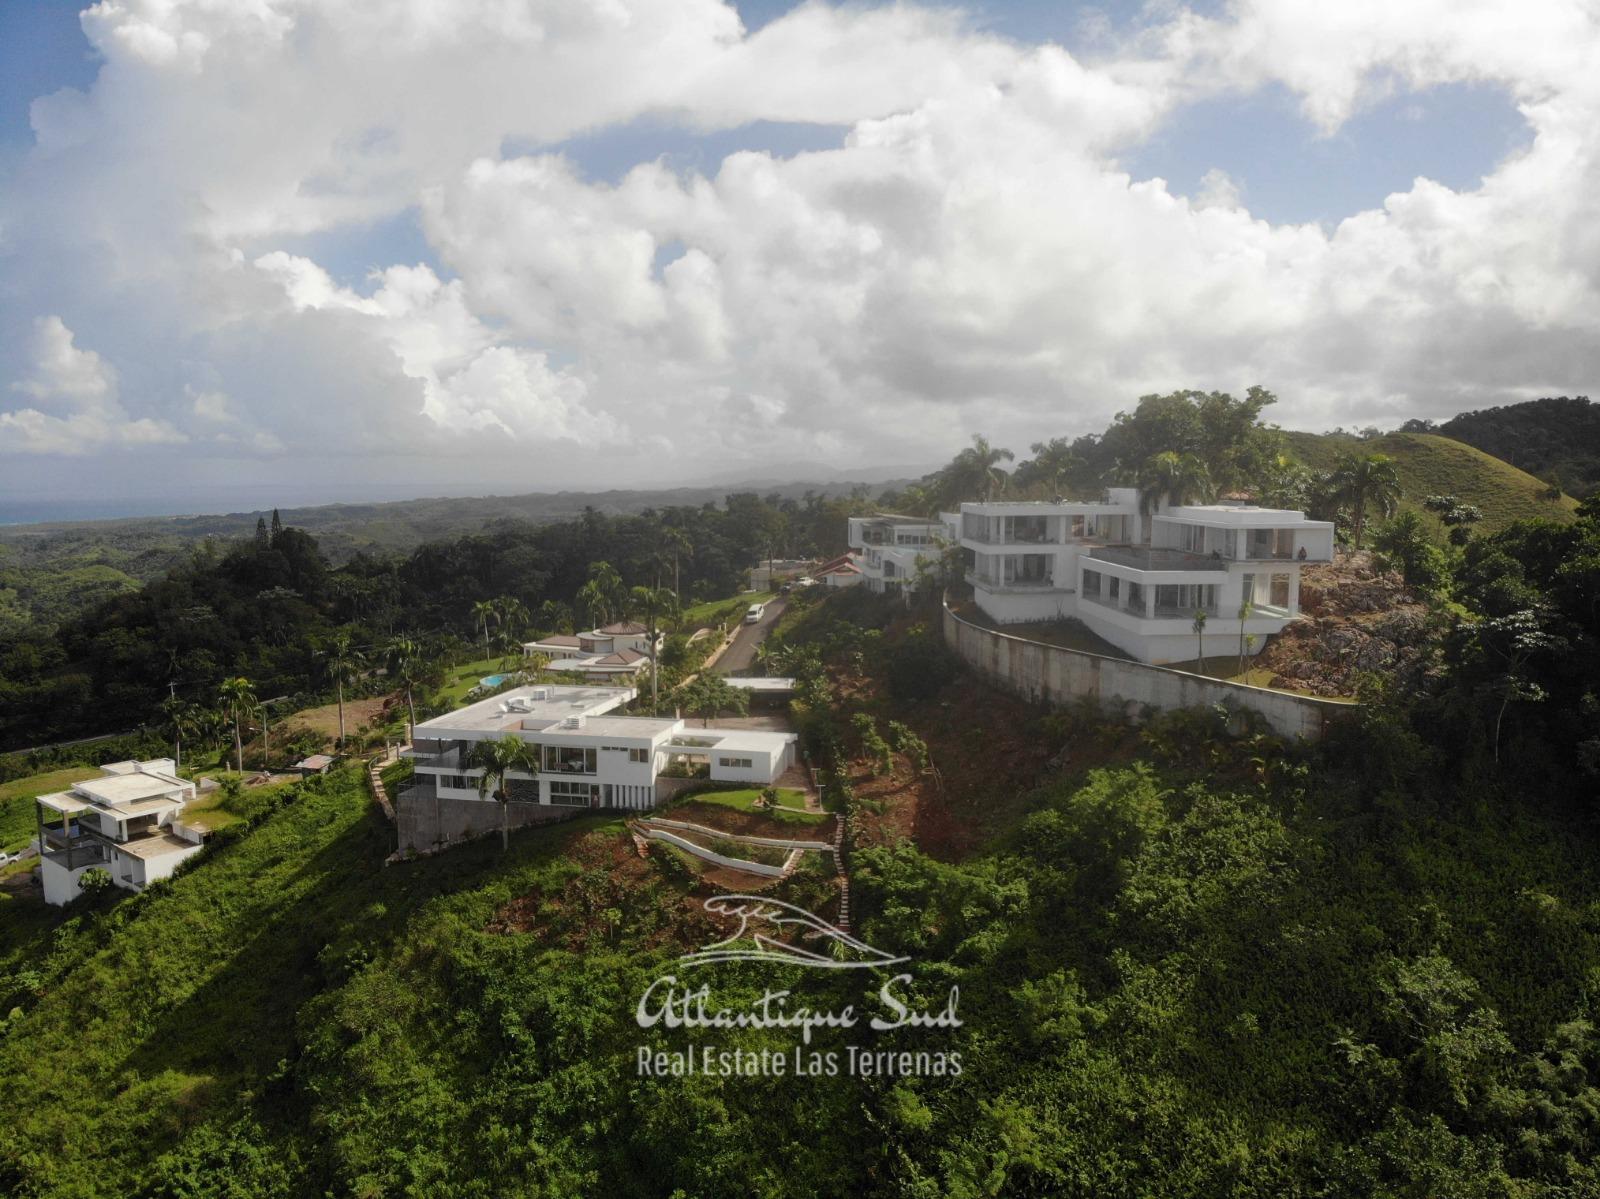 Hillside Lots for sale in Las Terrenas15.jpeg